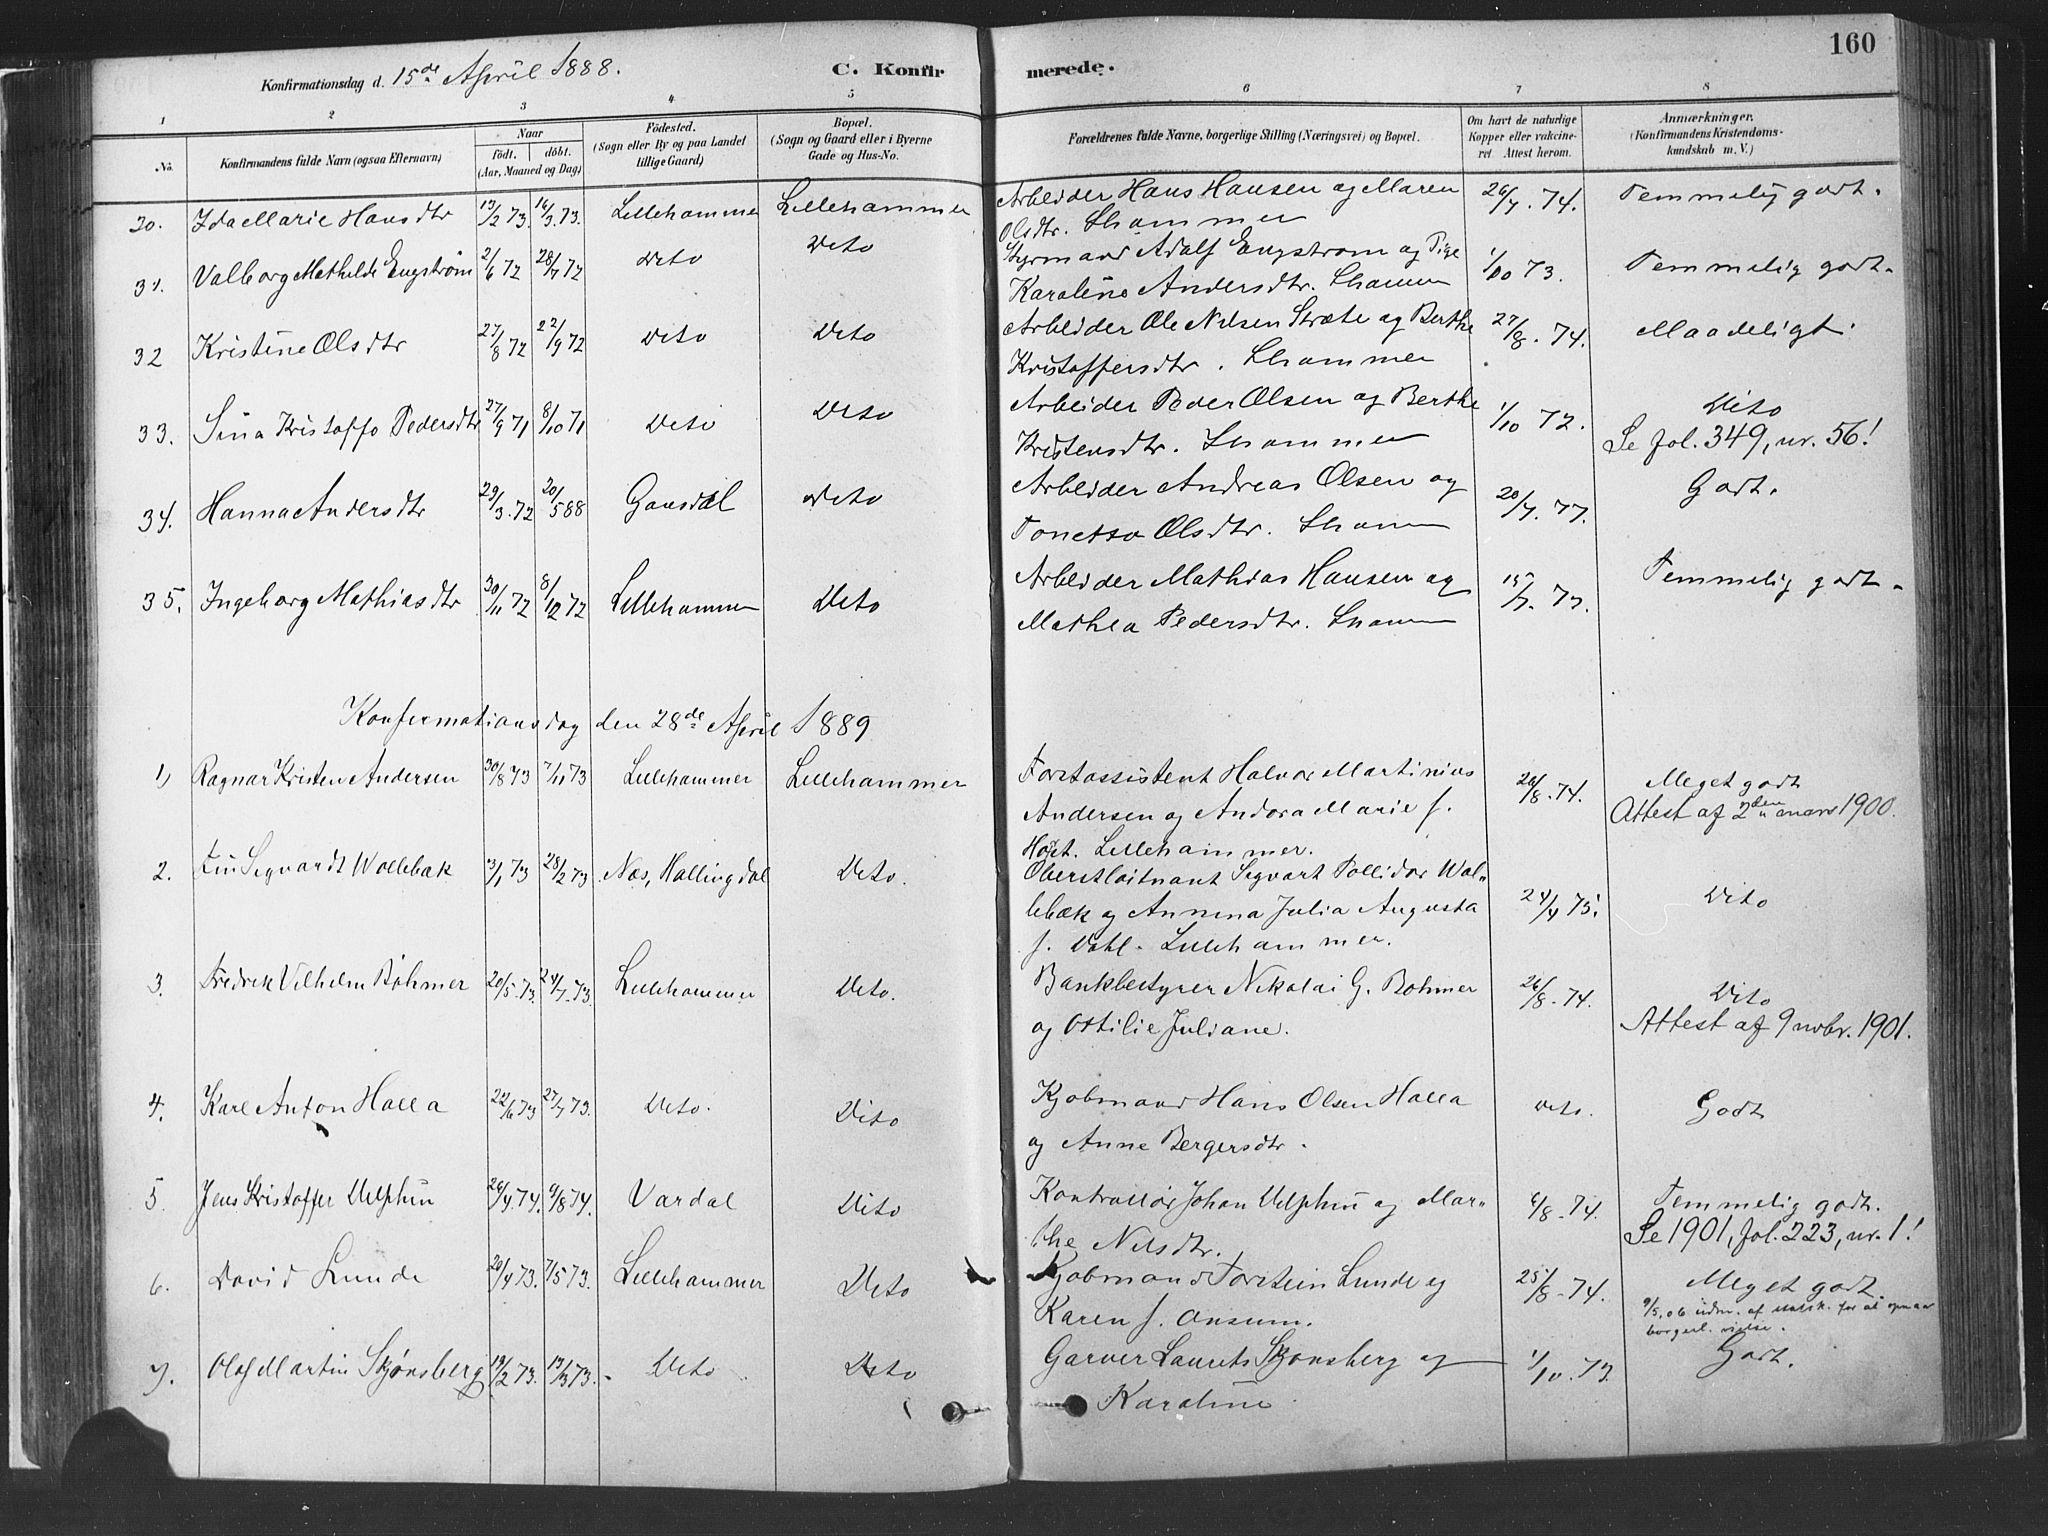 SAH, Fåberg prestekontor, Ministerialbok nr. 10, 1879-1900, s. 160